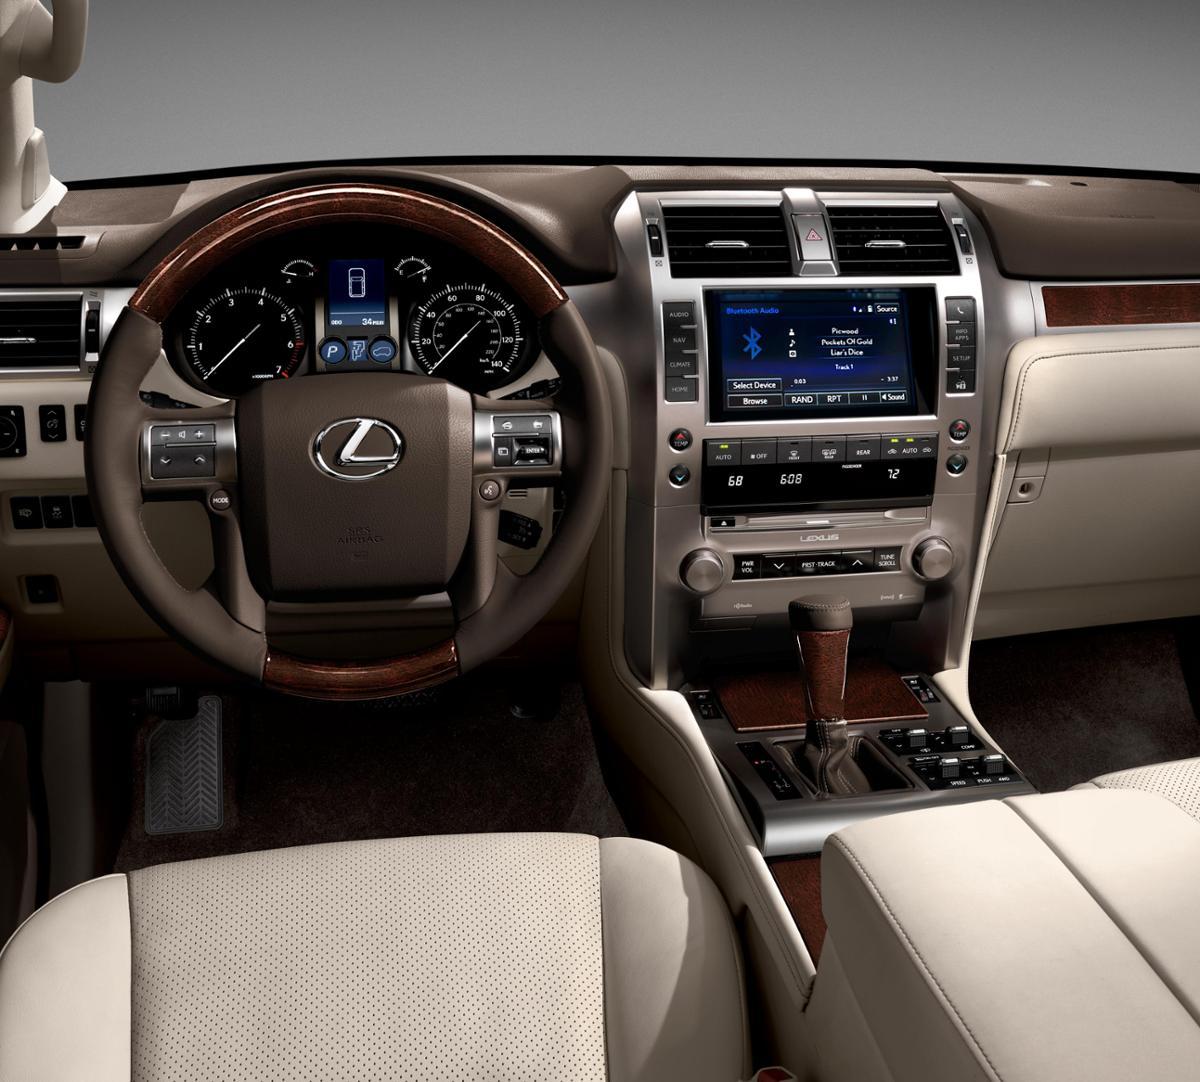 2013 Lexus 460 For Sale: 2019 Lexus GX 460